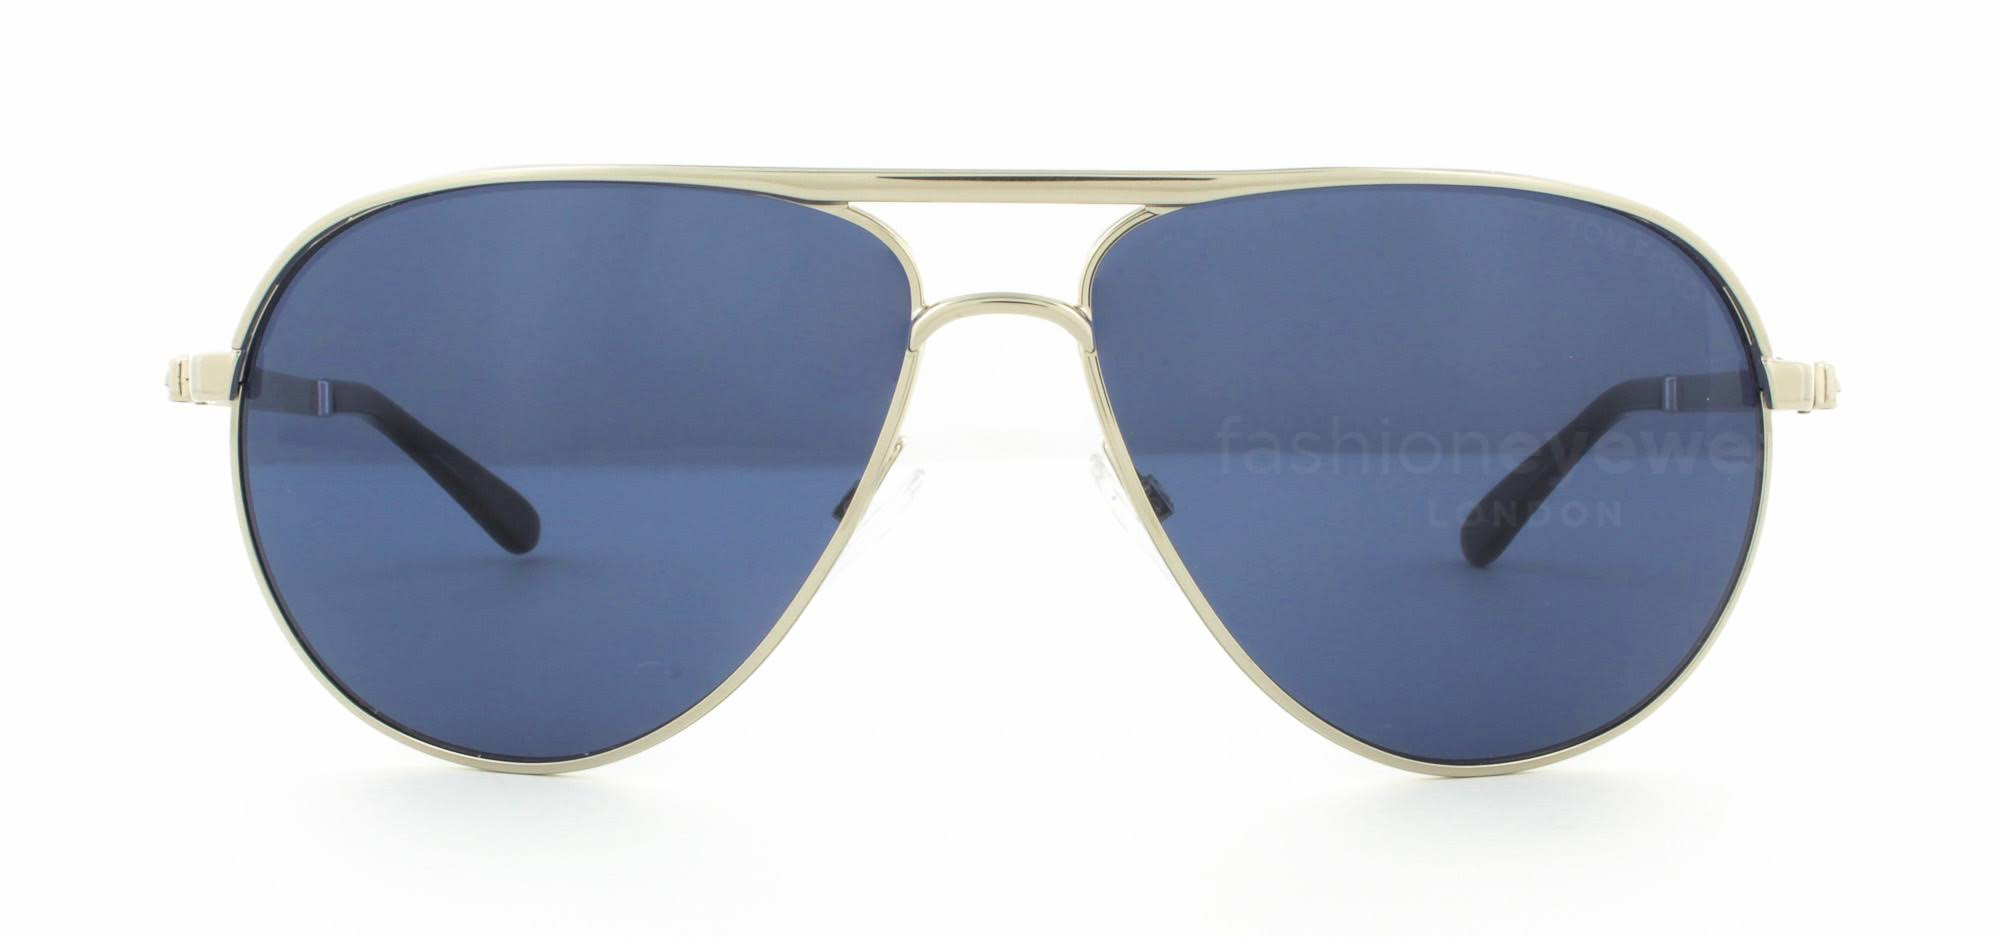 Tom Ford FT0144 18V Marko Sunglasses